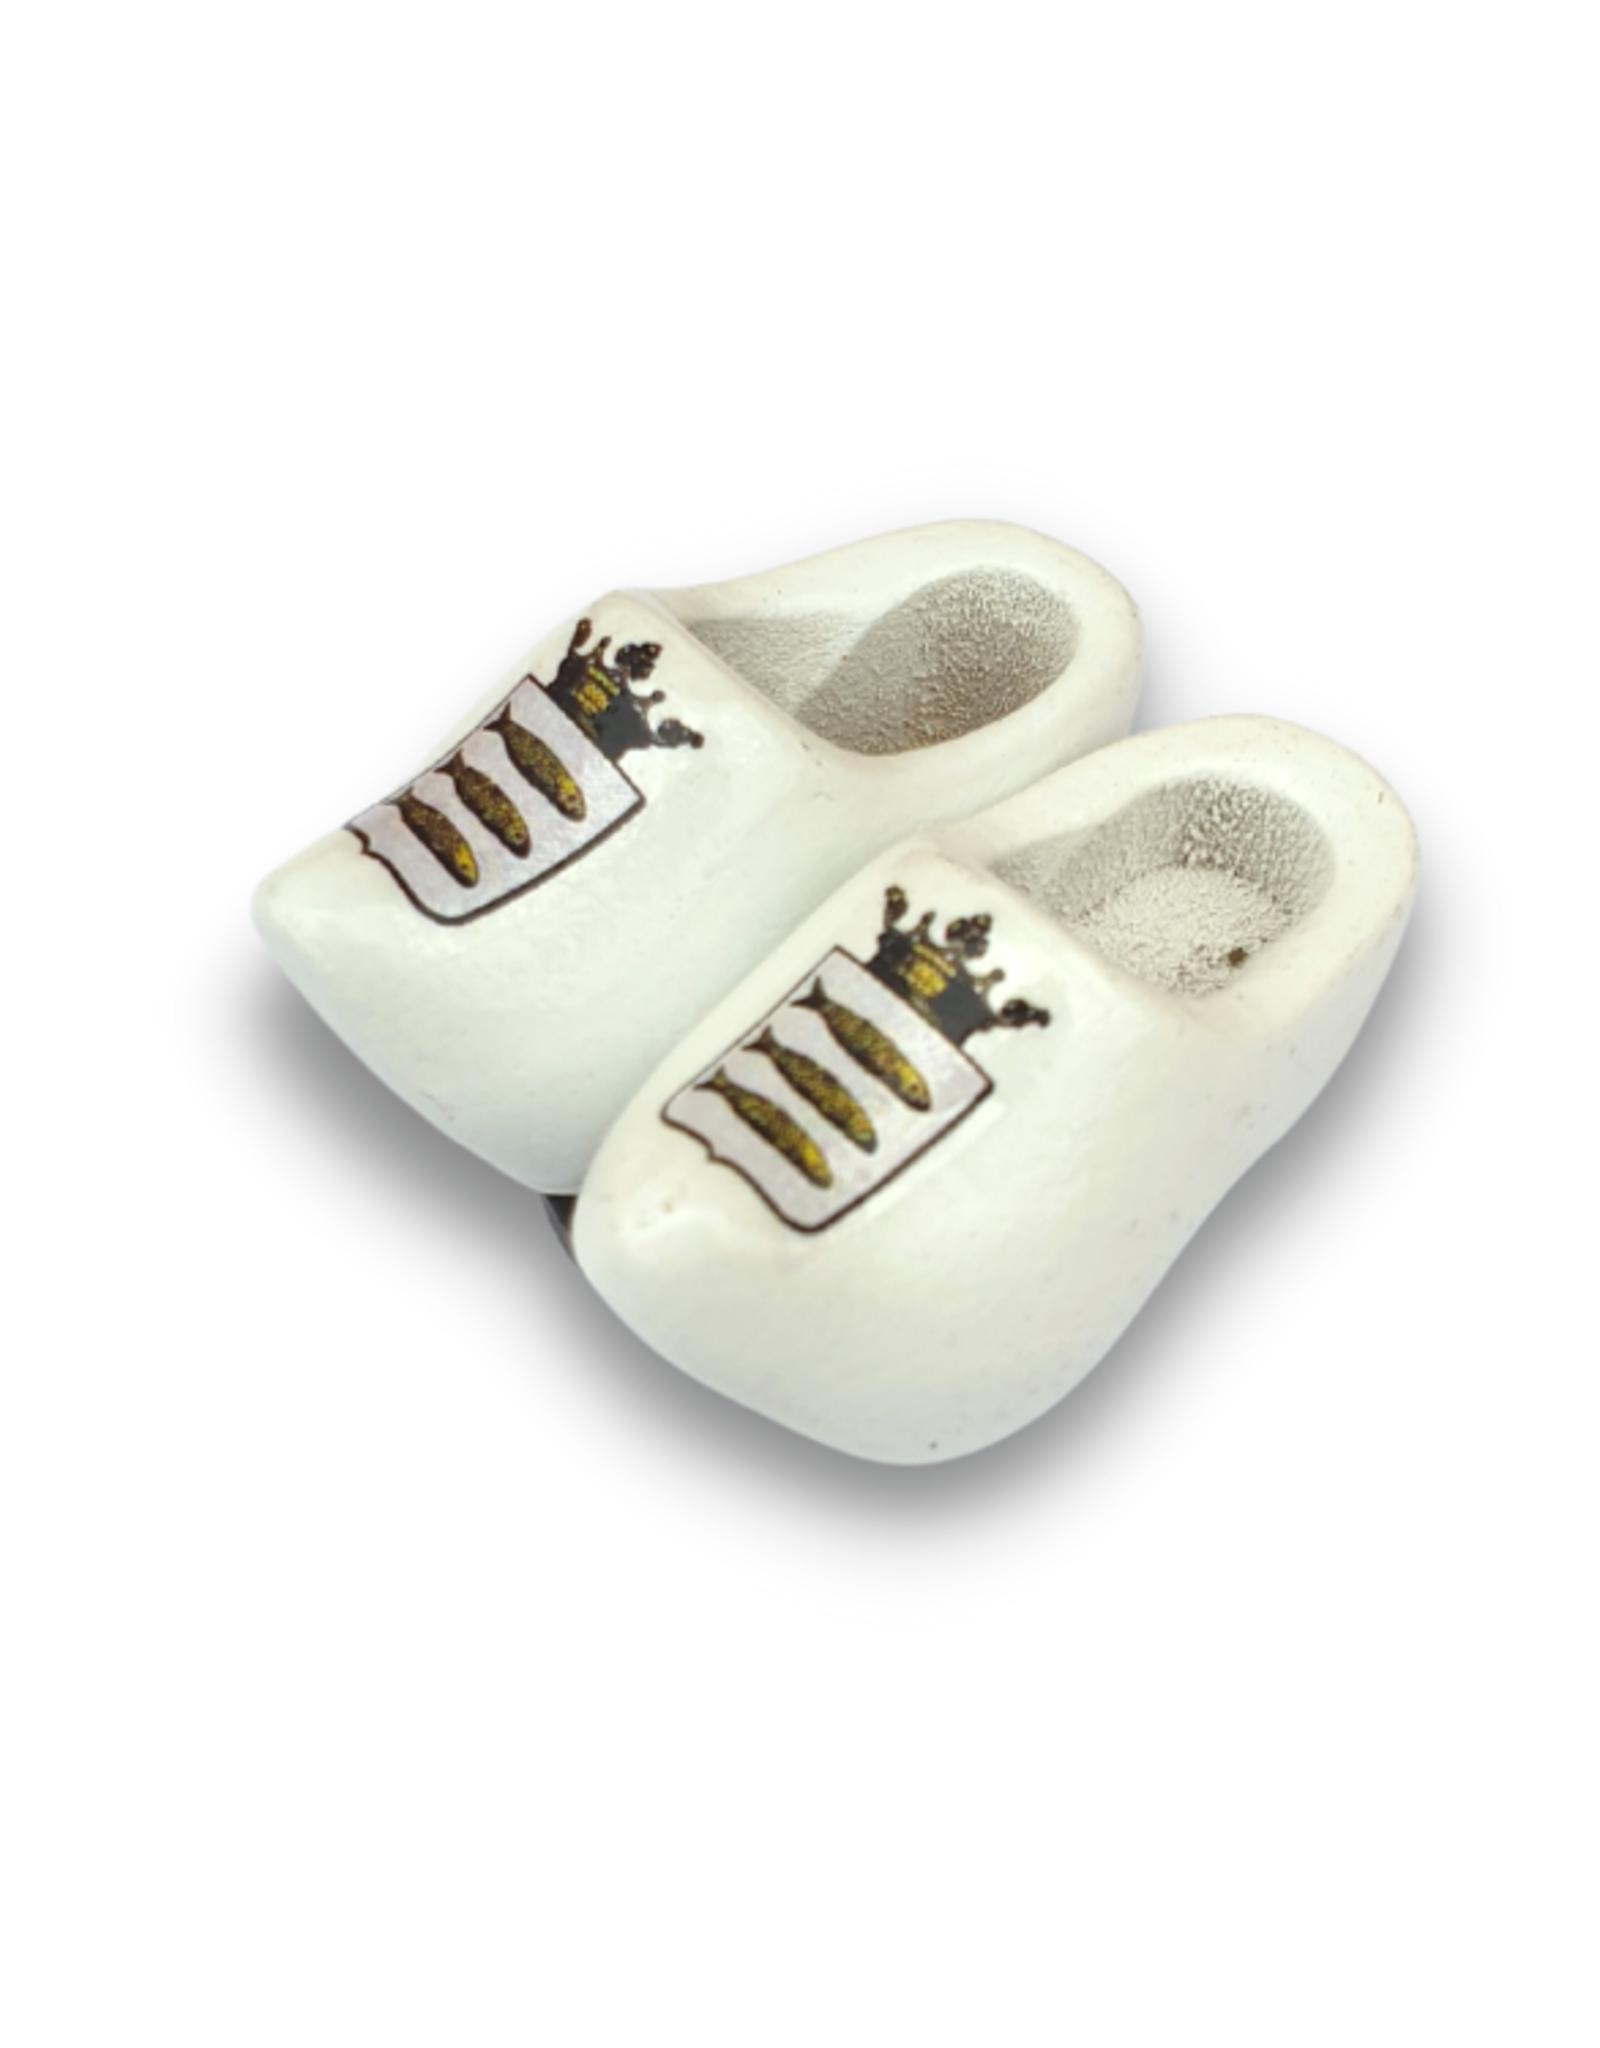 Klompjes magneet wit met logo of tekst